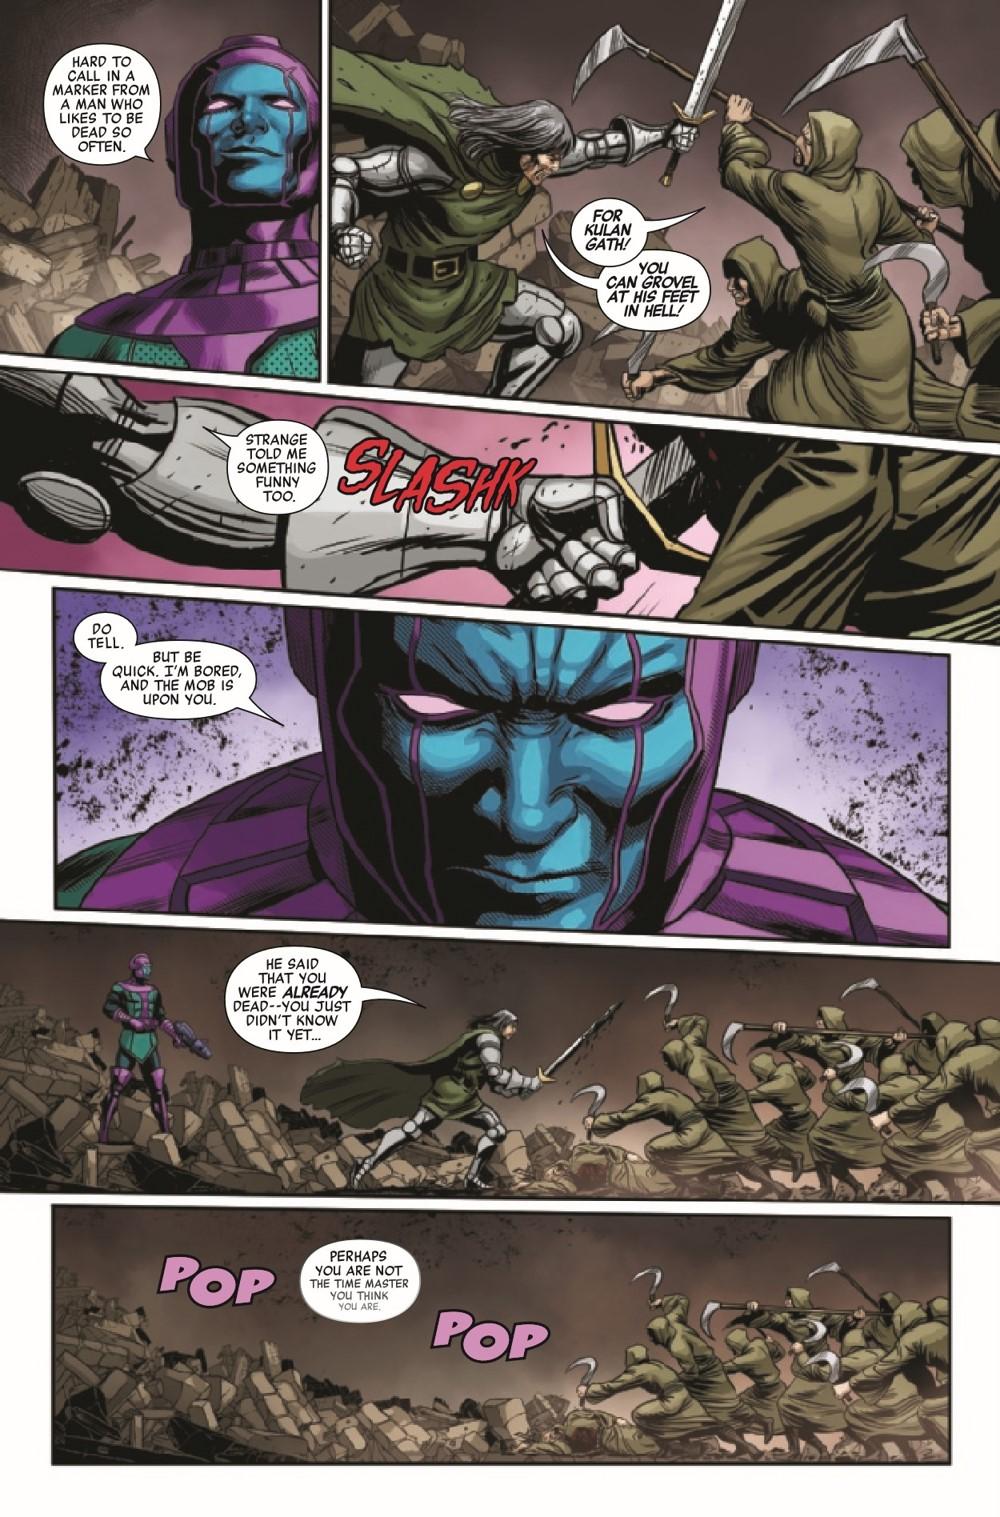 SAVAVEN2019025_Preview-5 ComicList Previews: SAVAGE AVENGERS #25